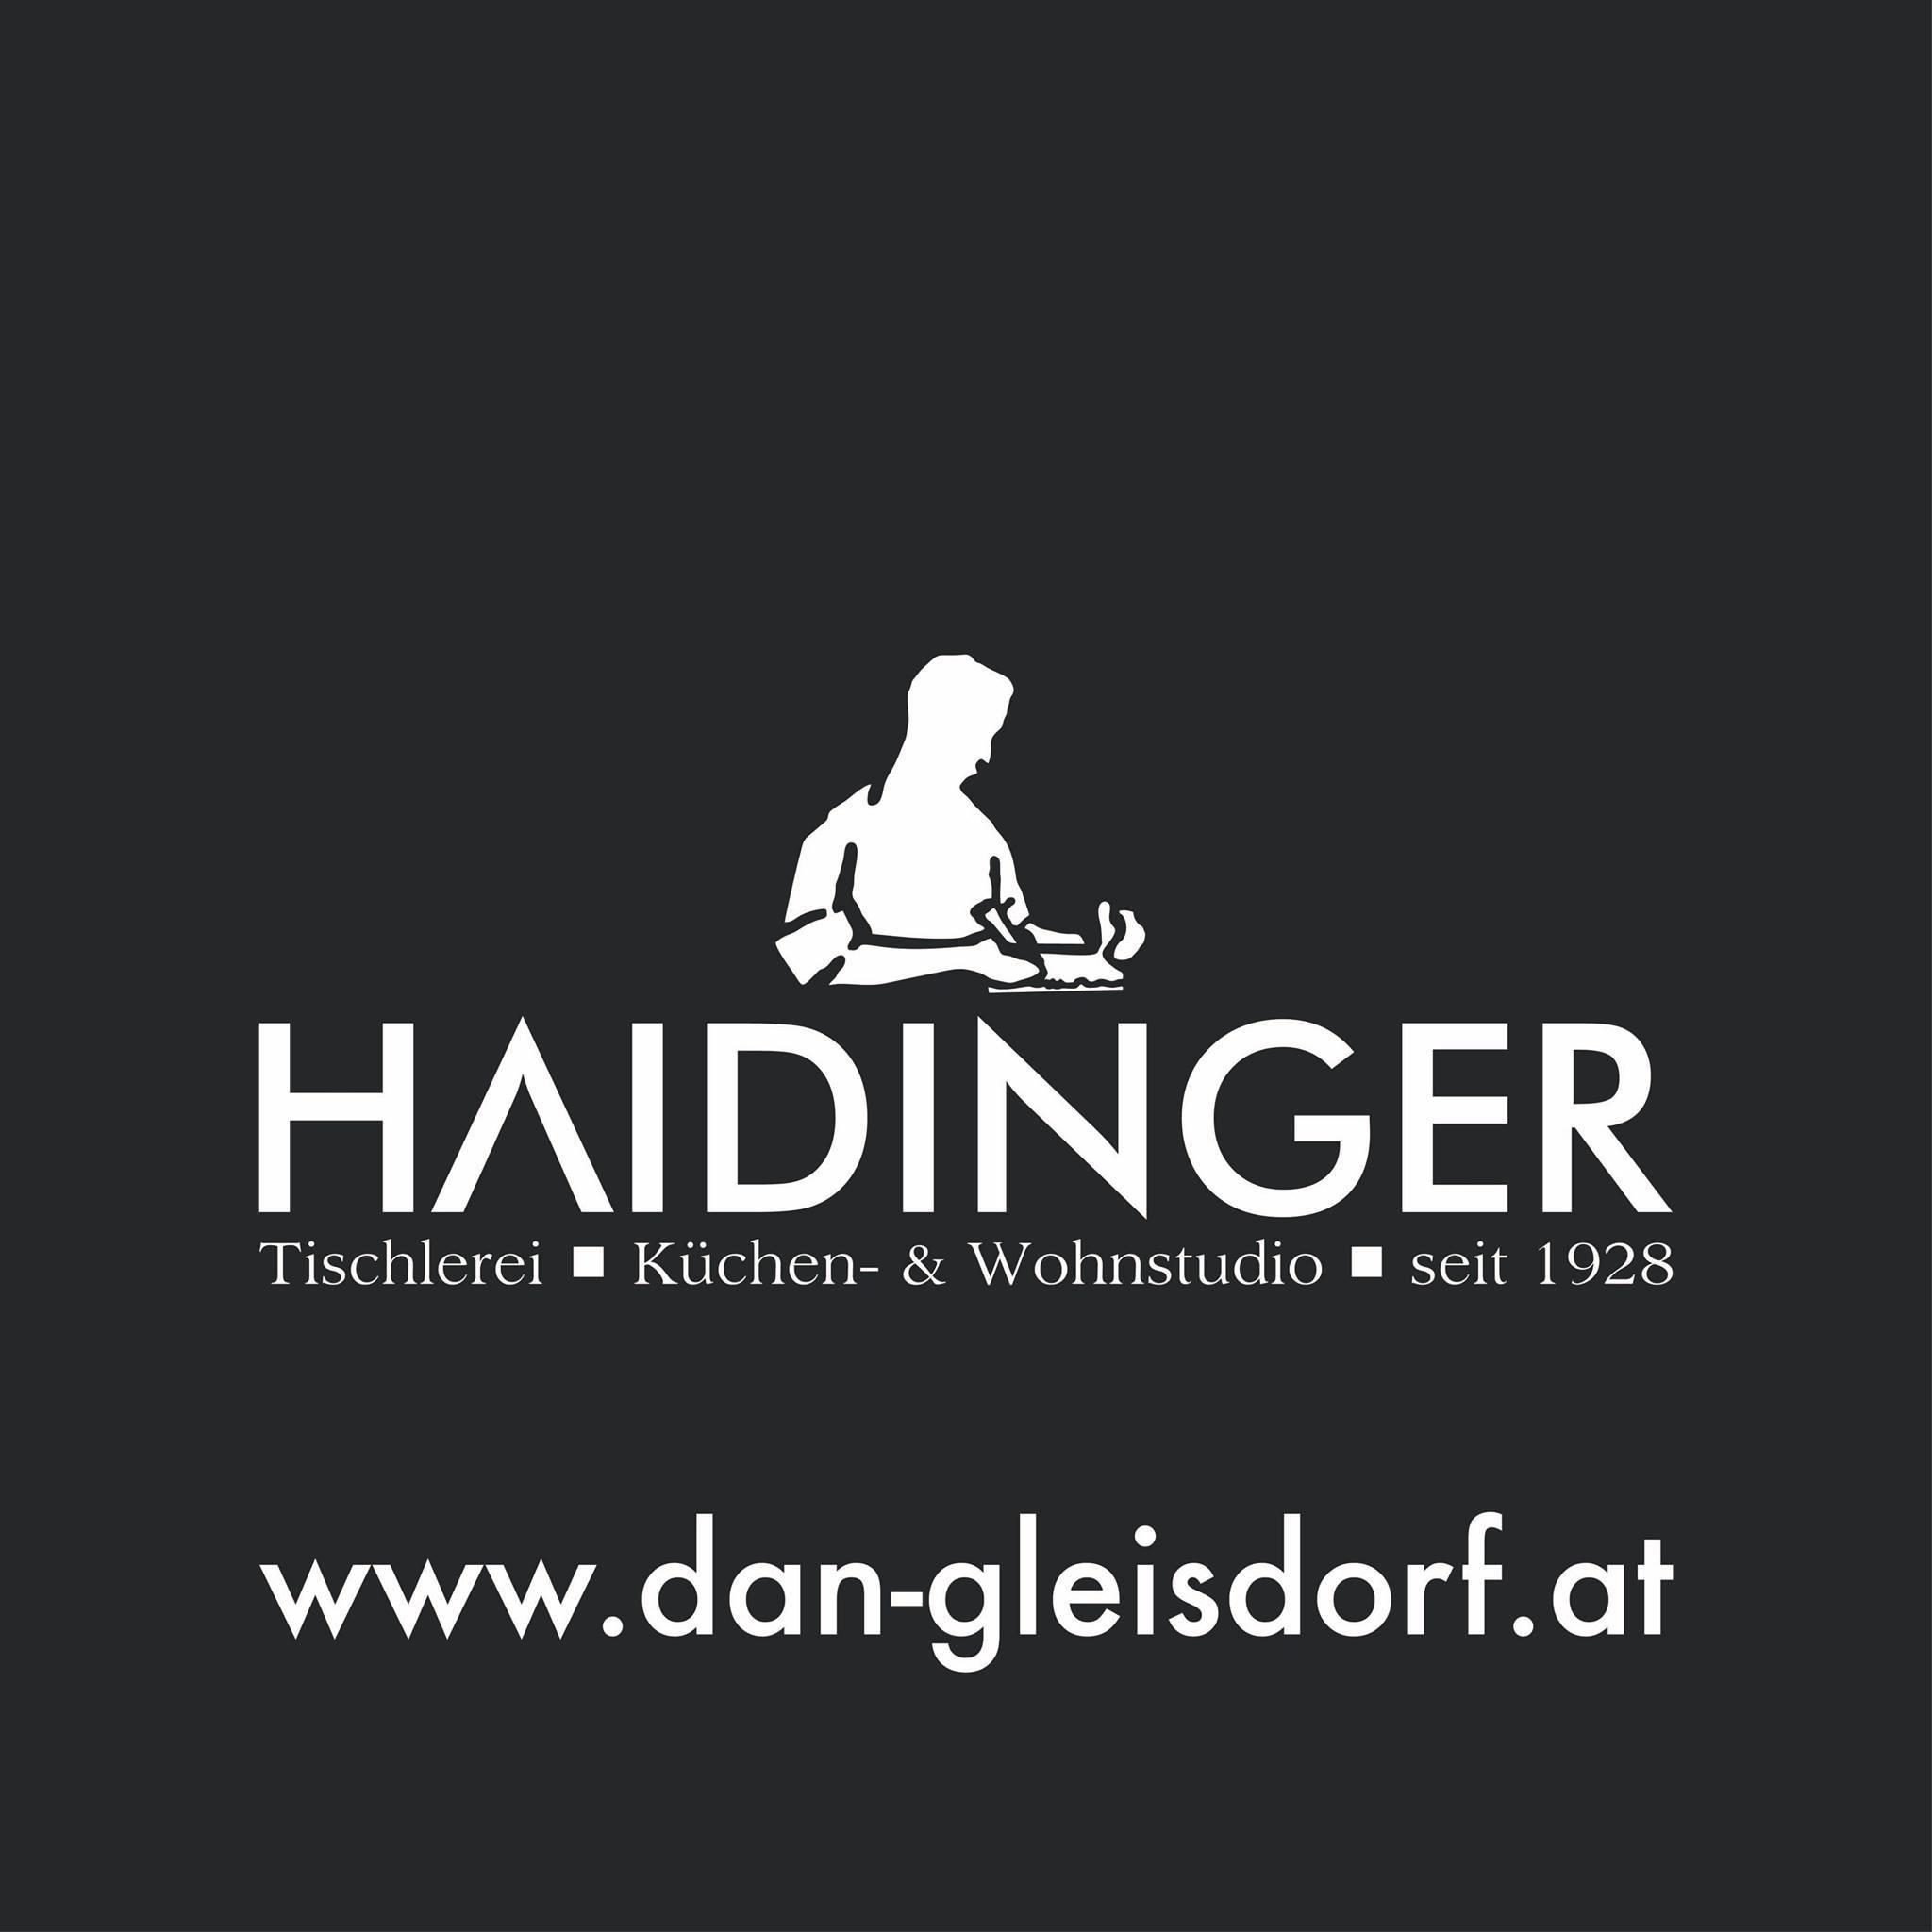 Home - Haidinger | {Dan küchen logo 82}